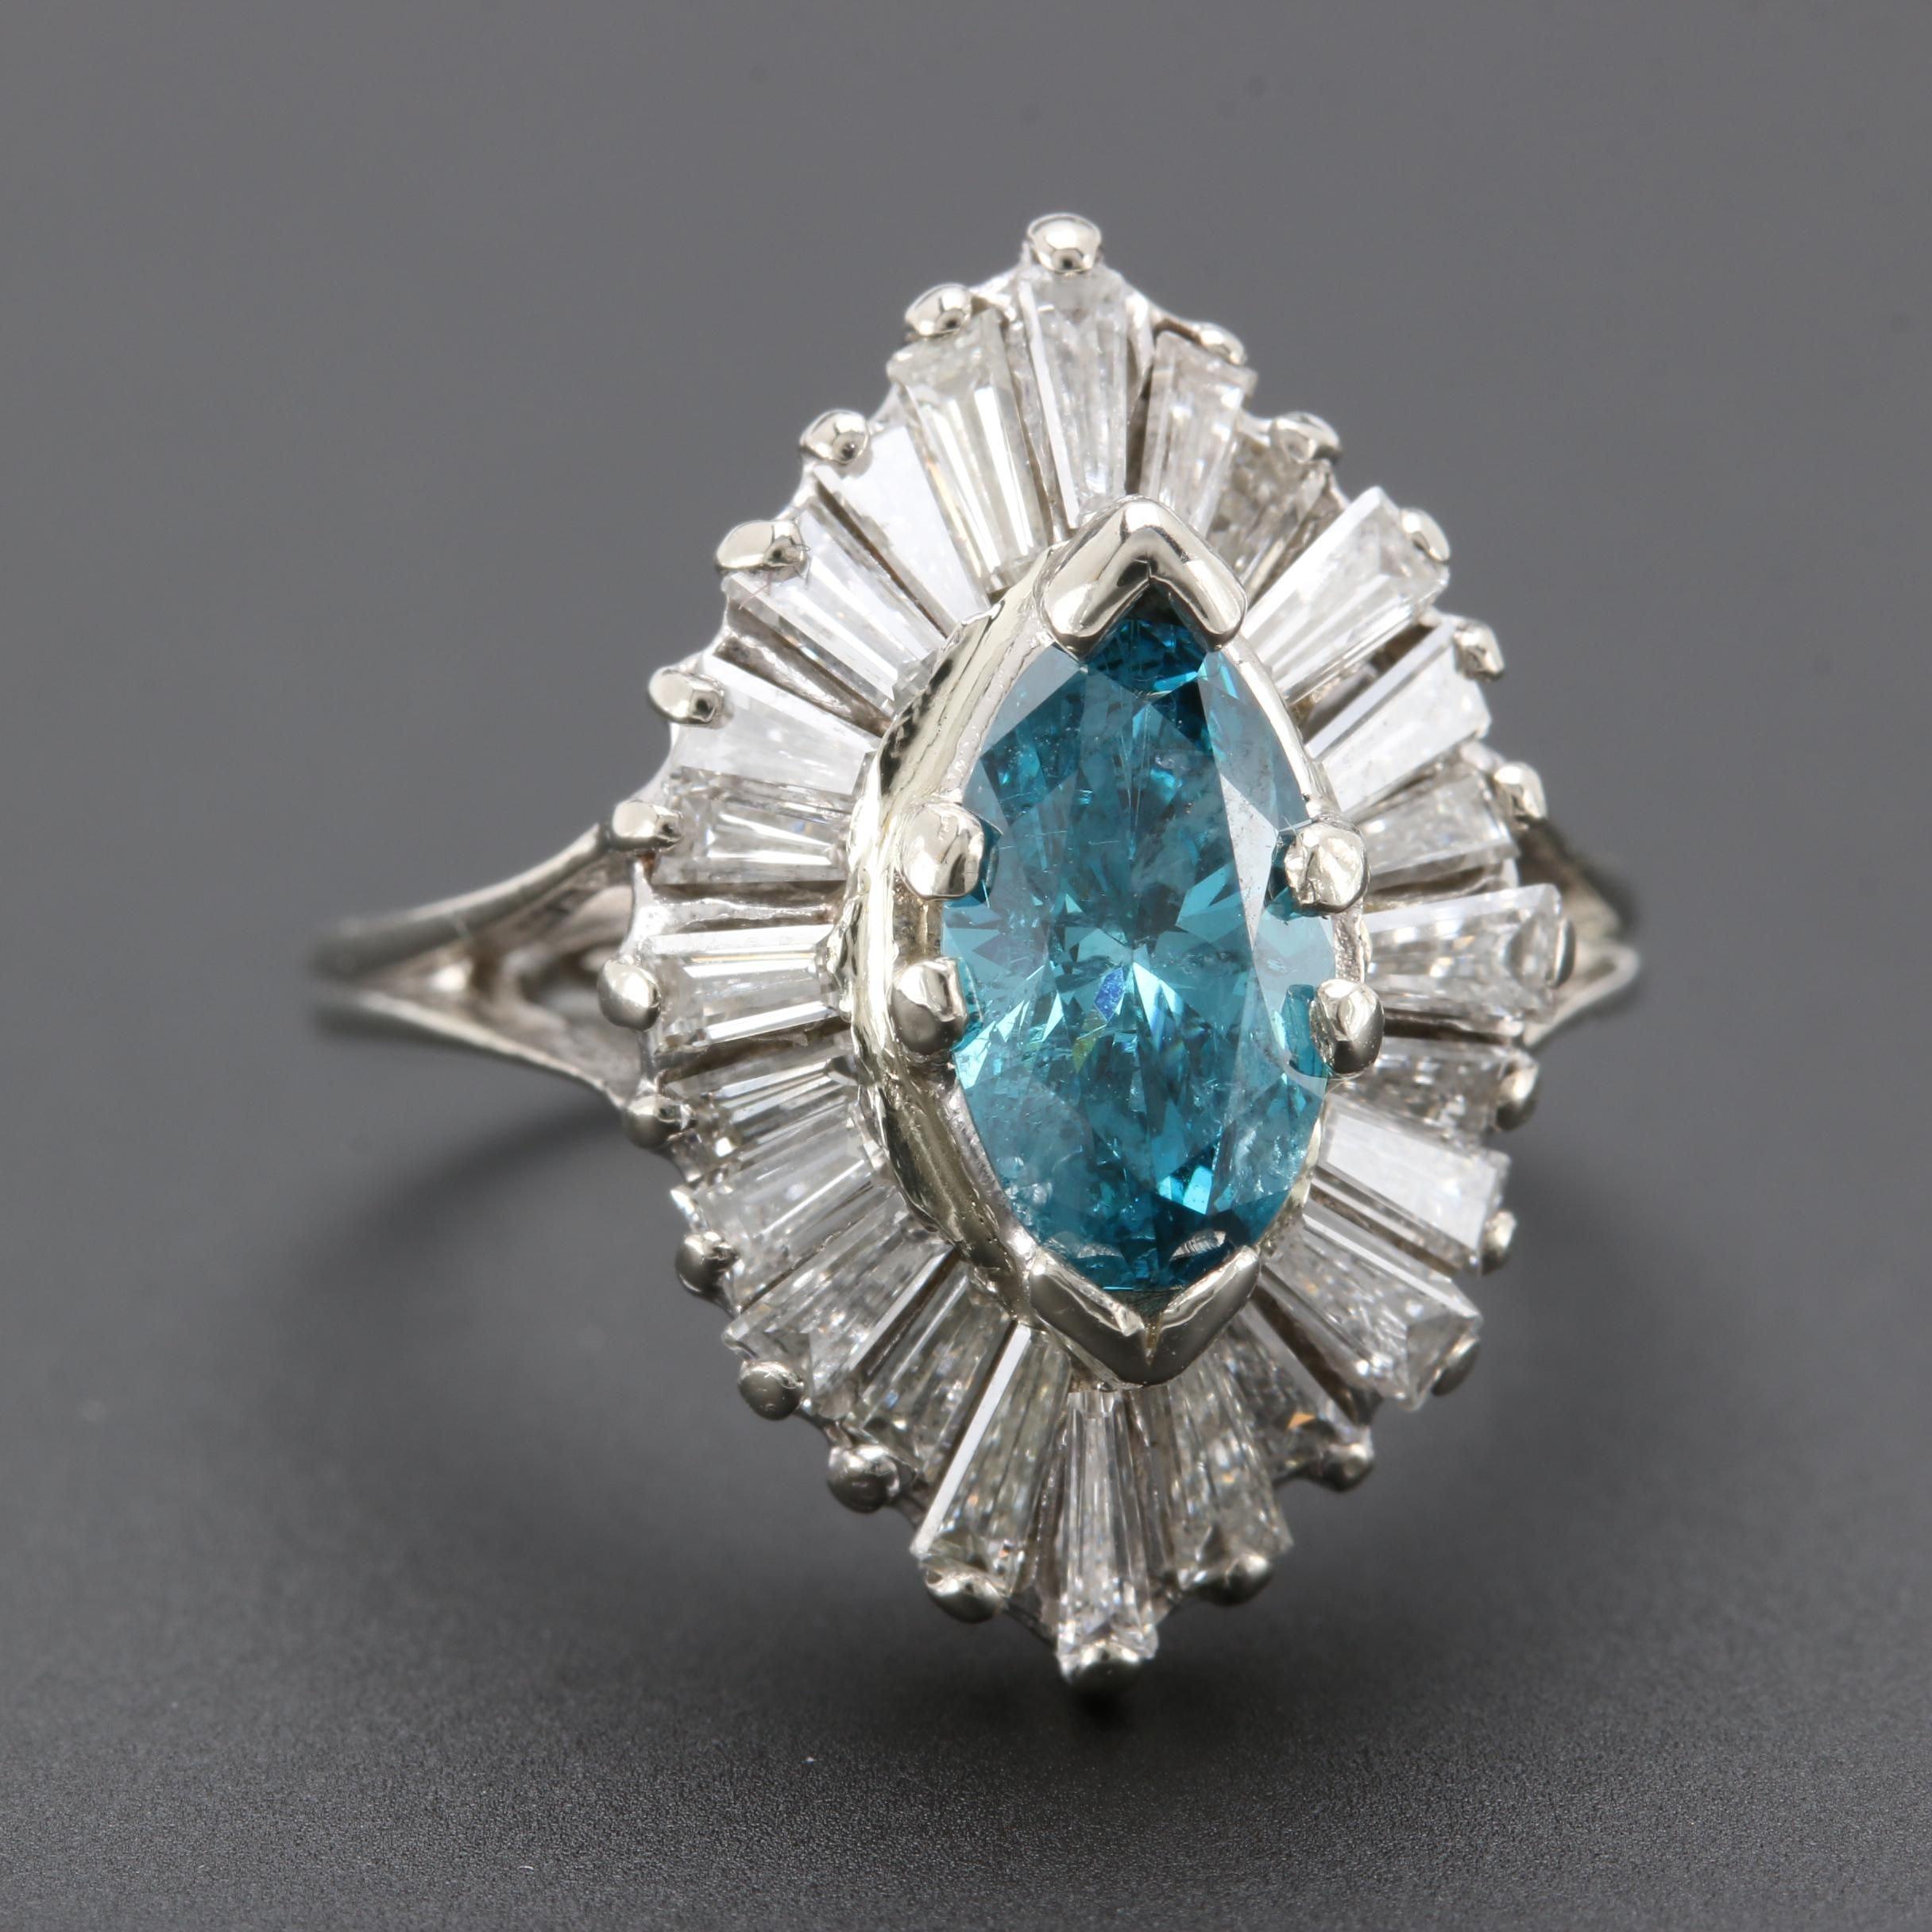 Vintage 14K White Gold 1.71 CTW Diamond Ring